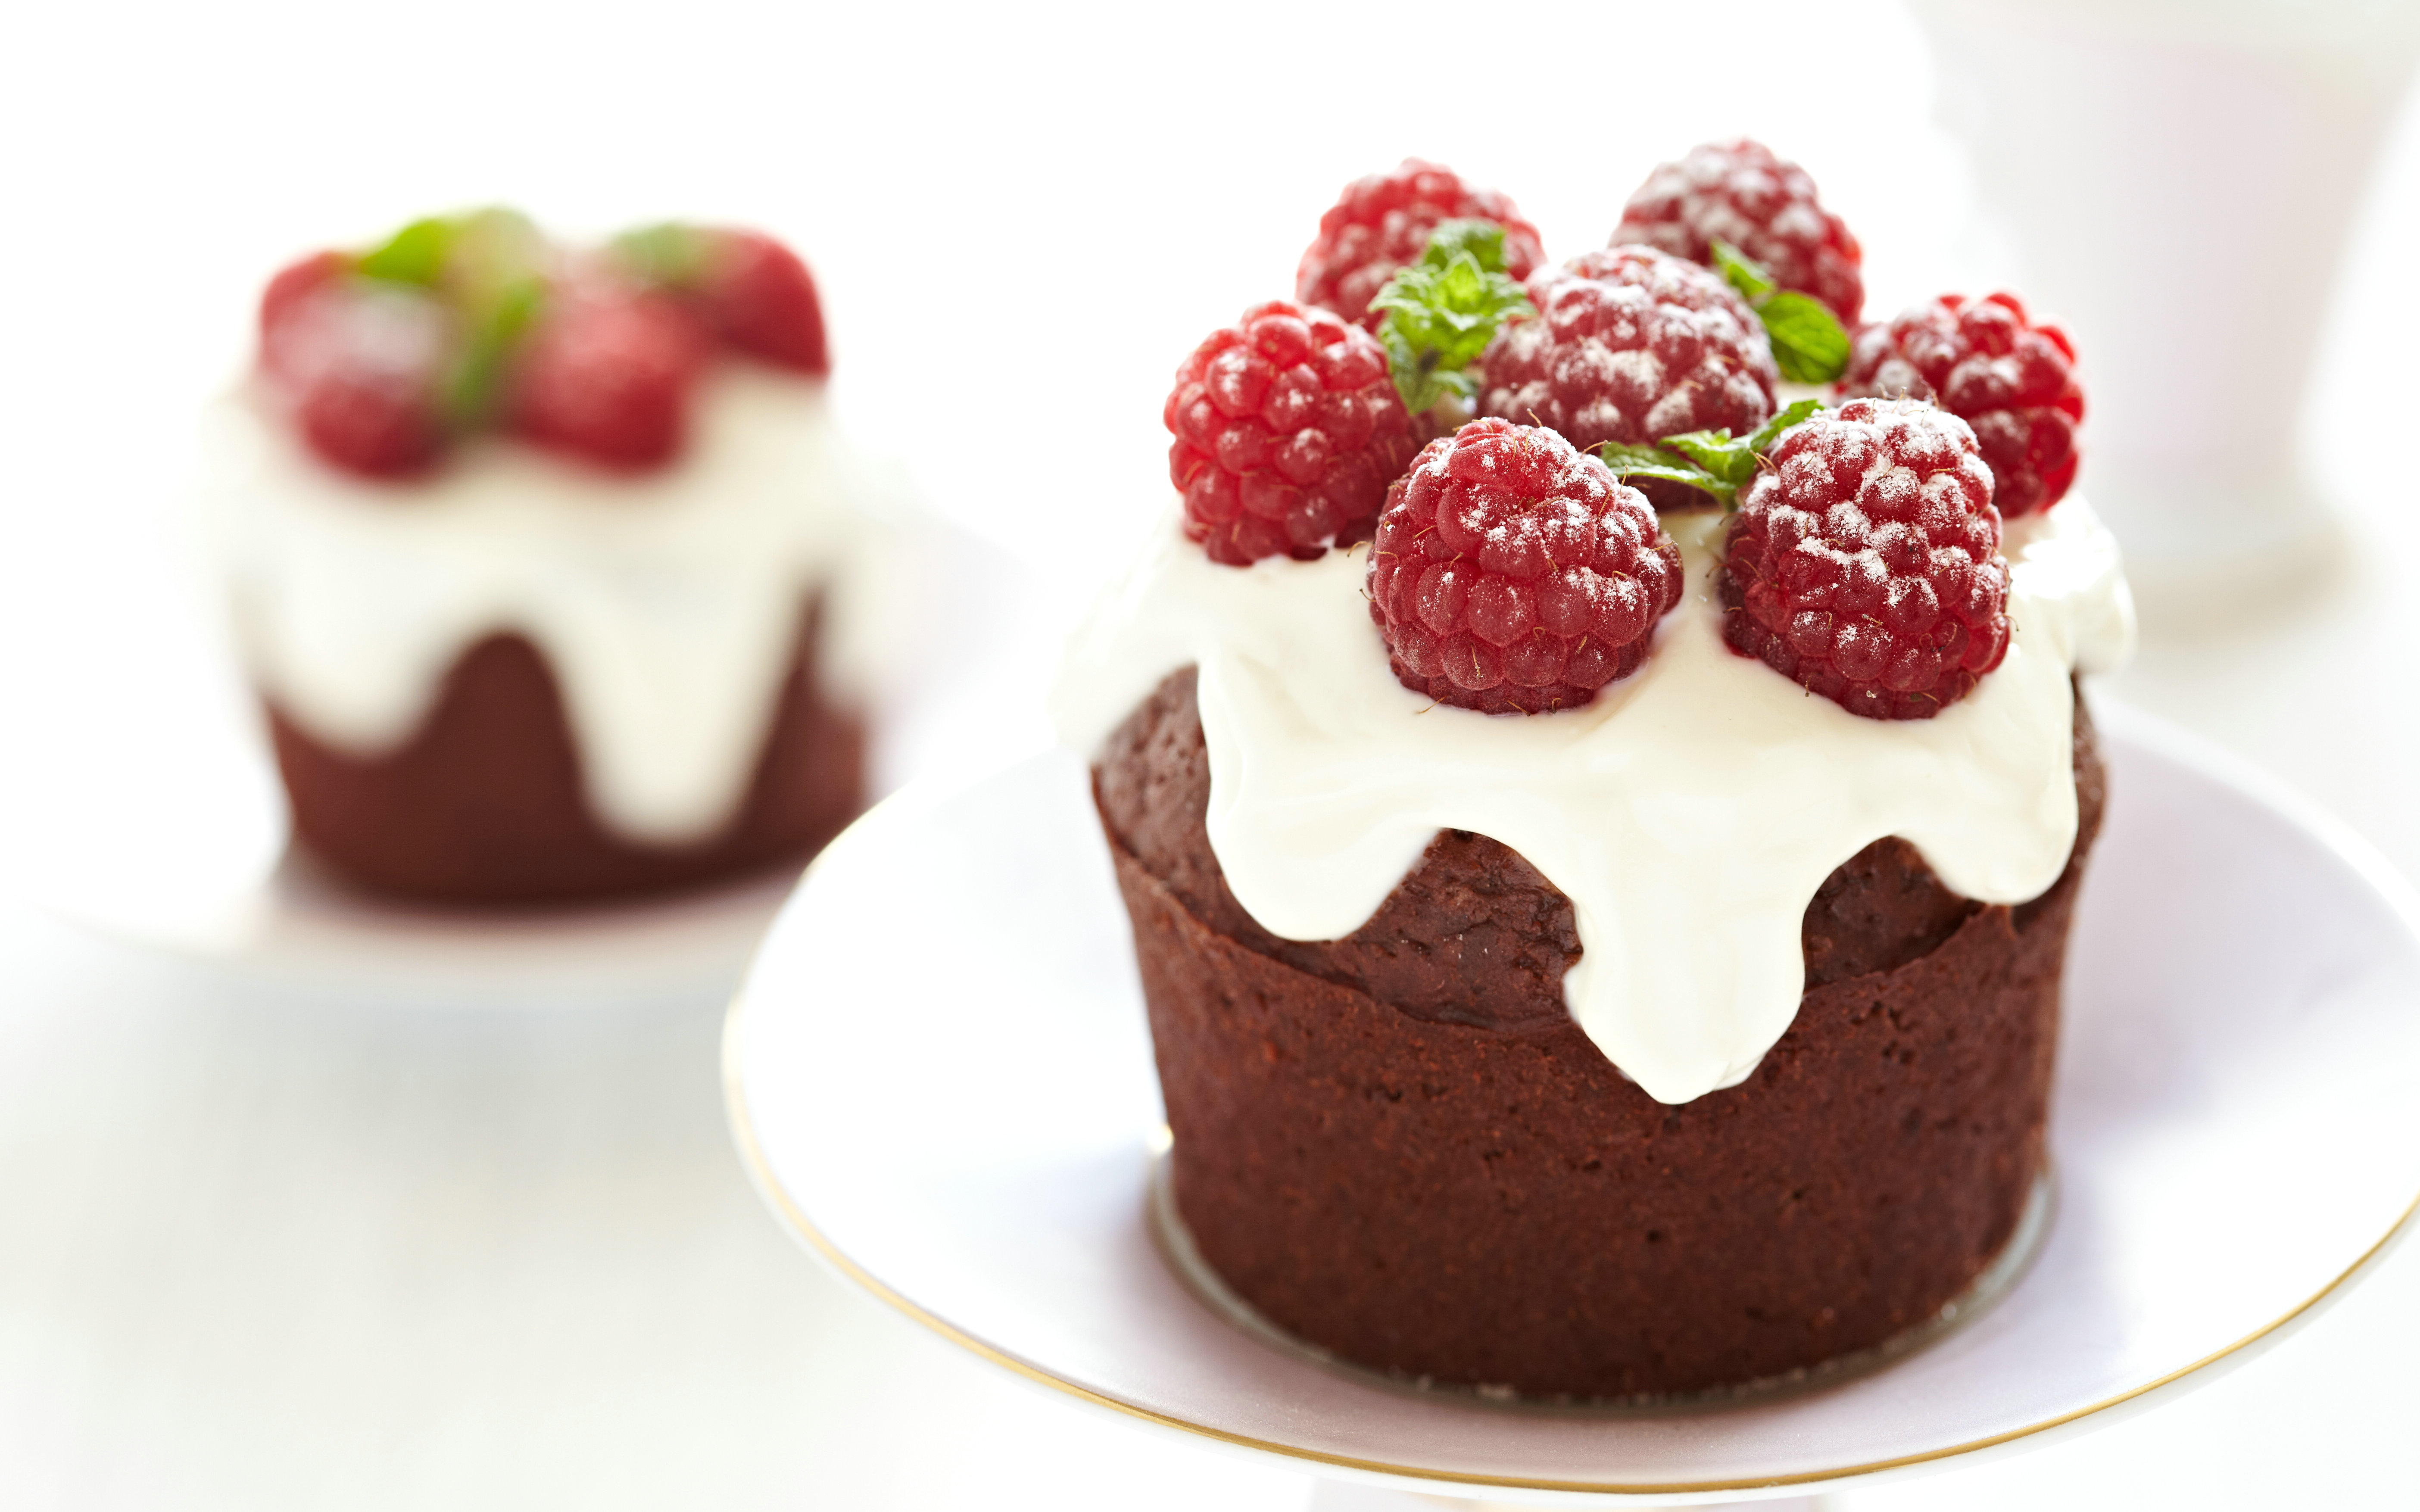 Images of Dessert   5616x3509